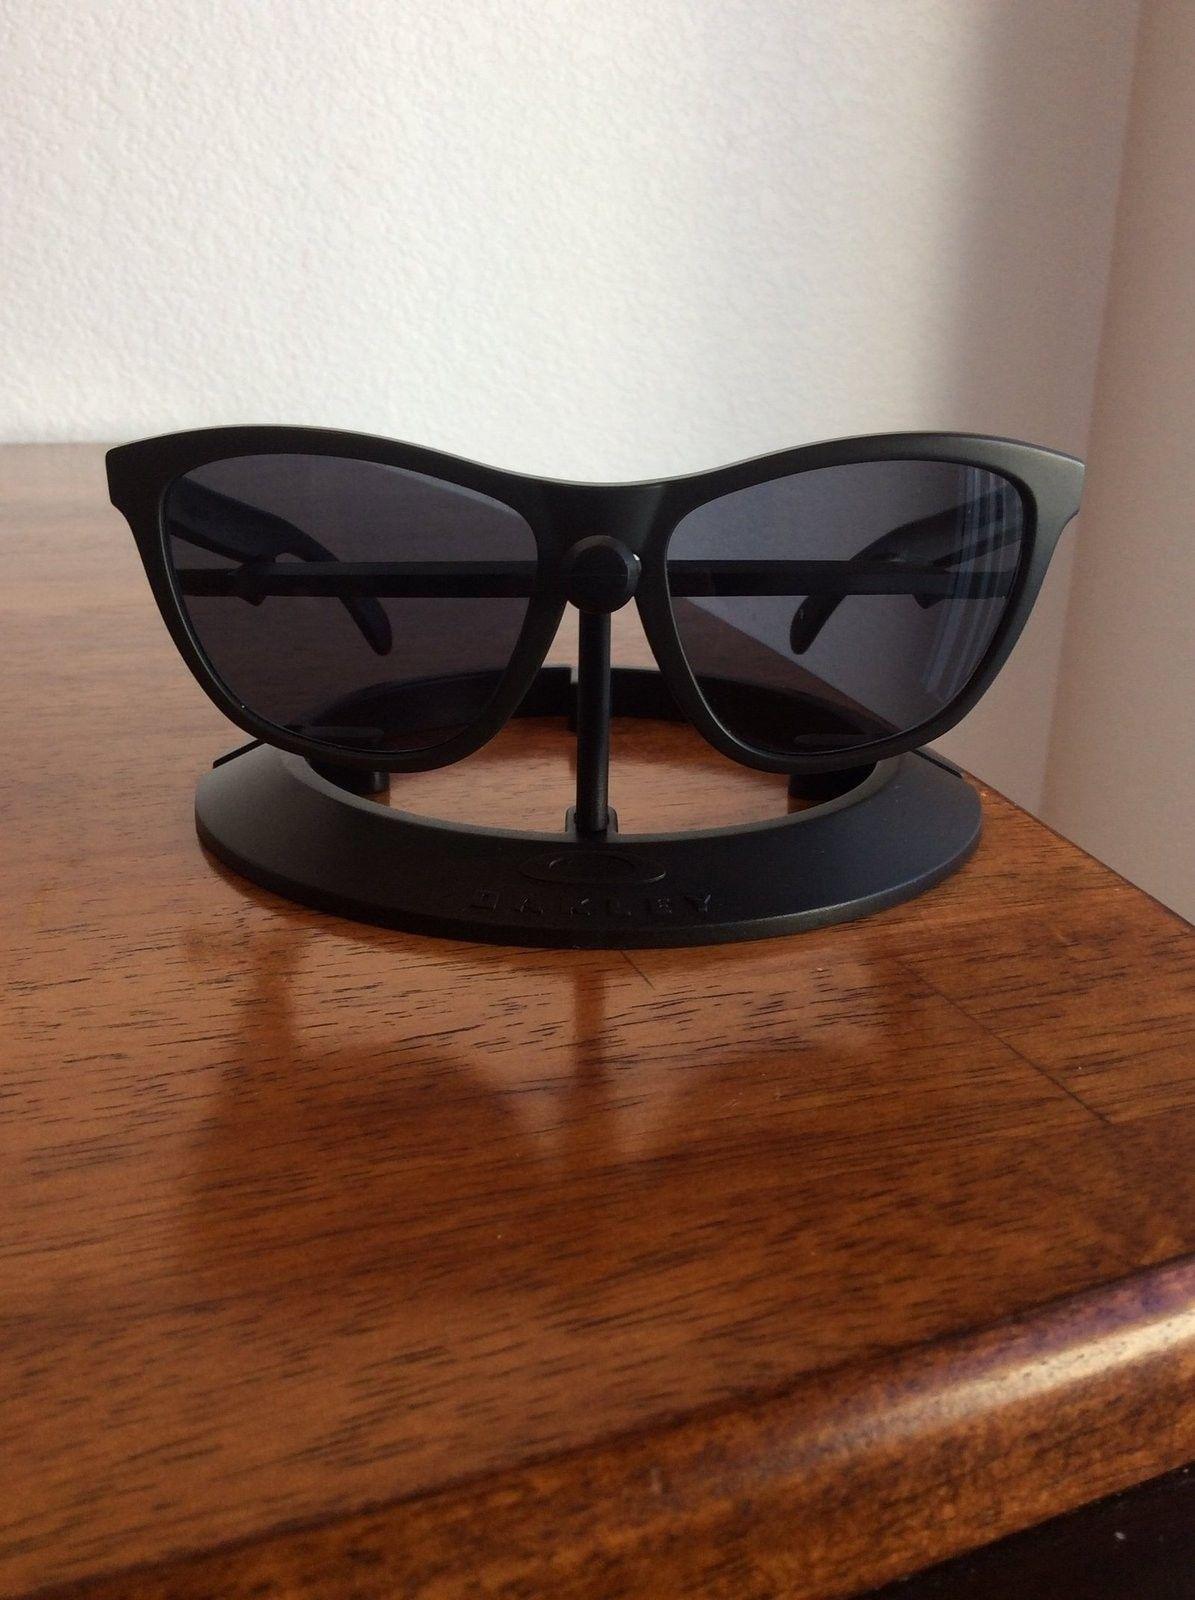 Oakley Frogskins Carbon Infinite Hero frame/grey lenses cheap - image.jpeg